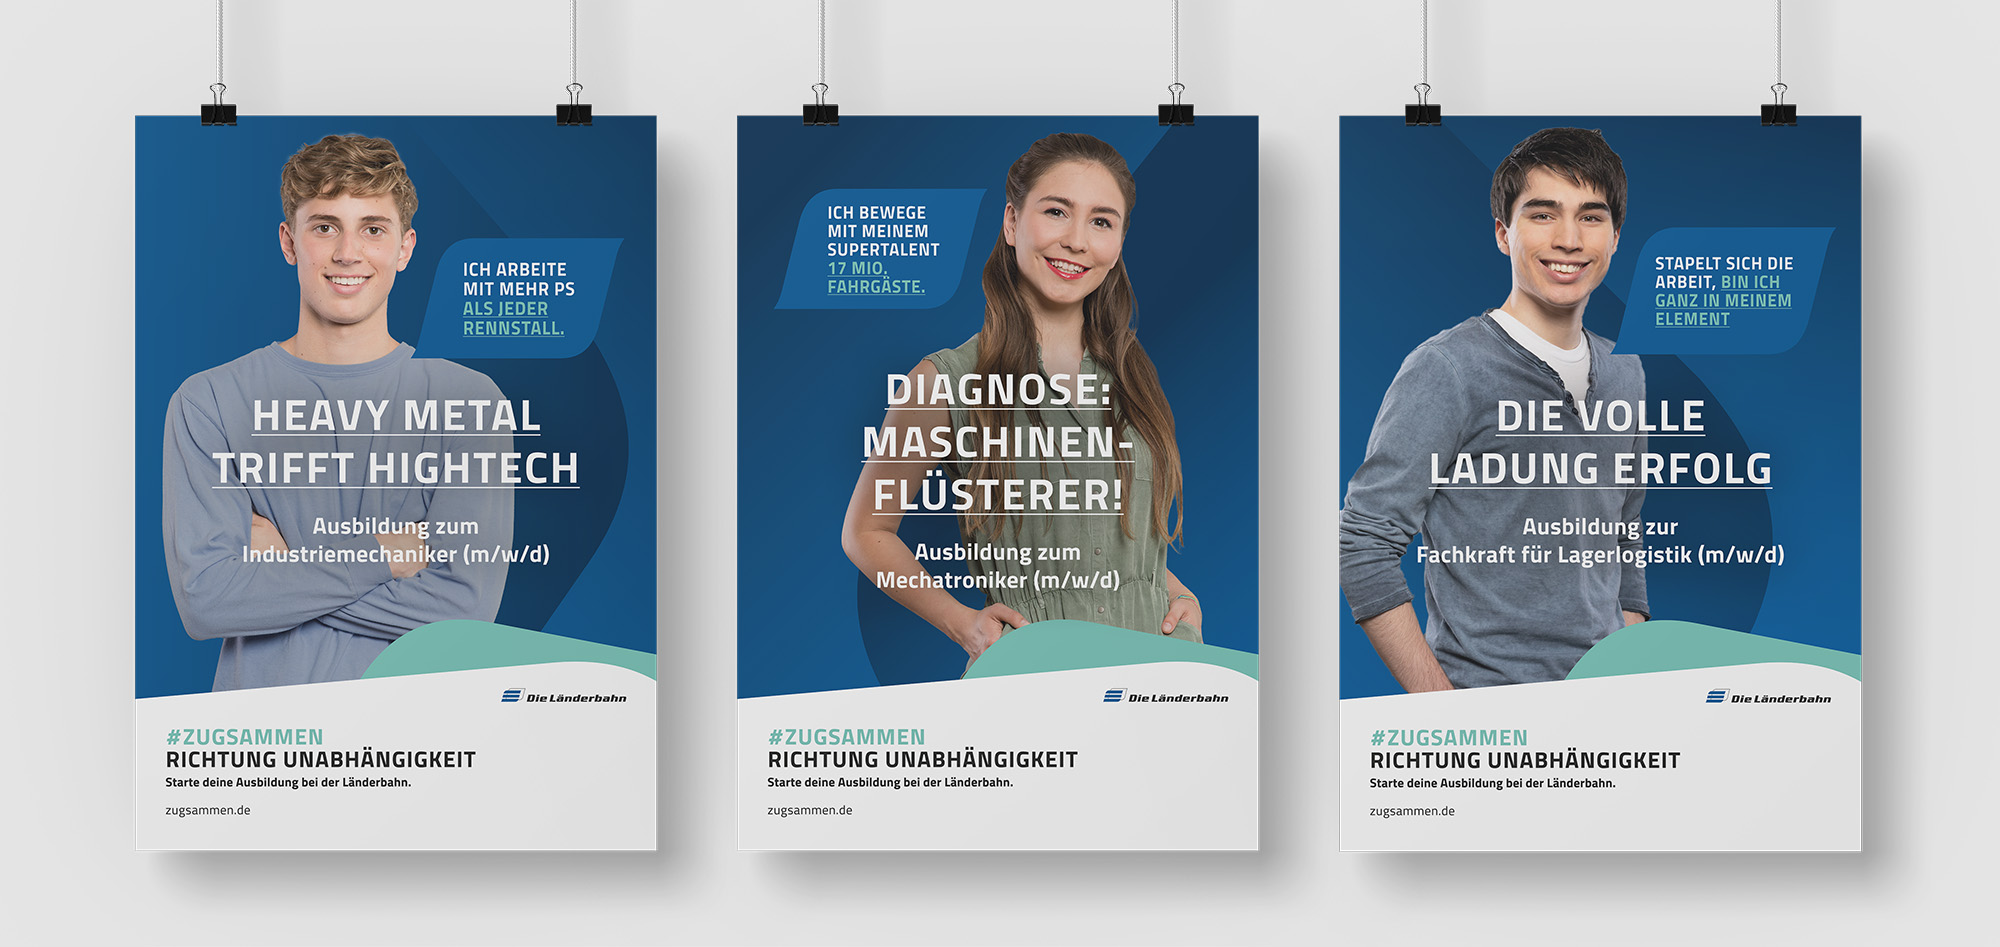 Länderbahn Recruiting / Plakate